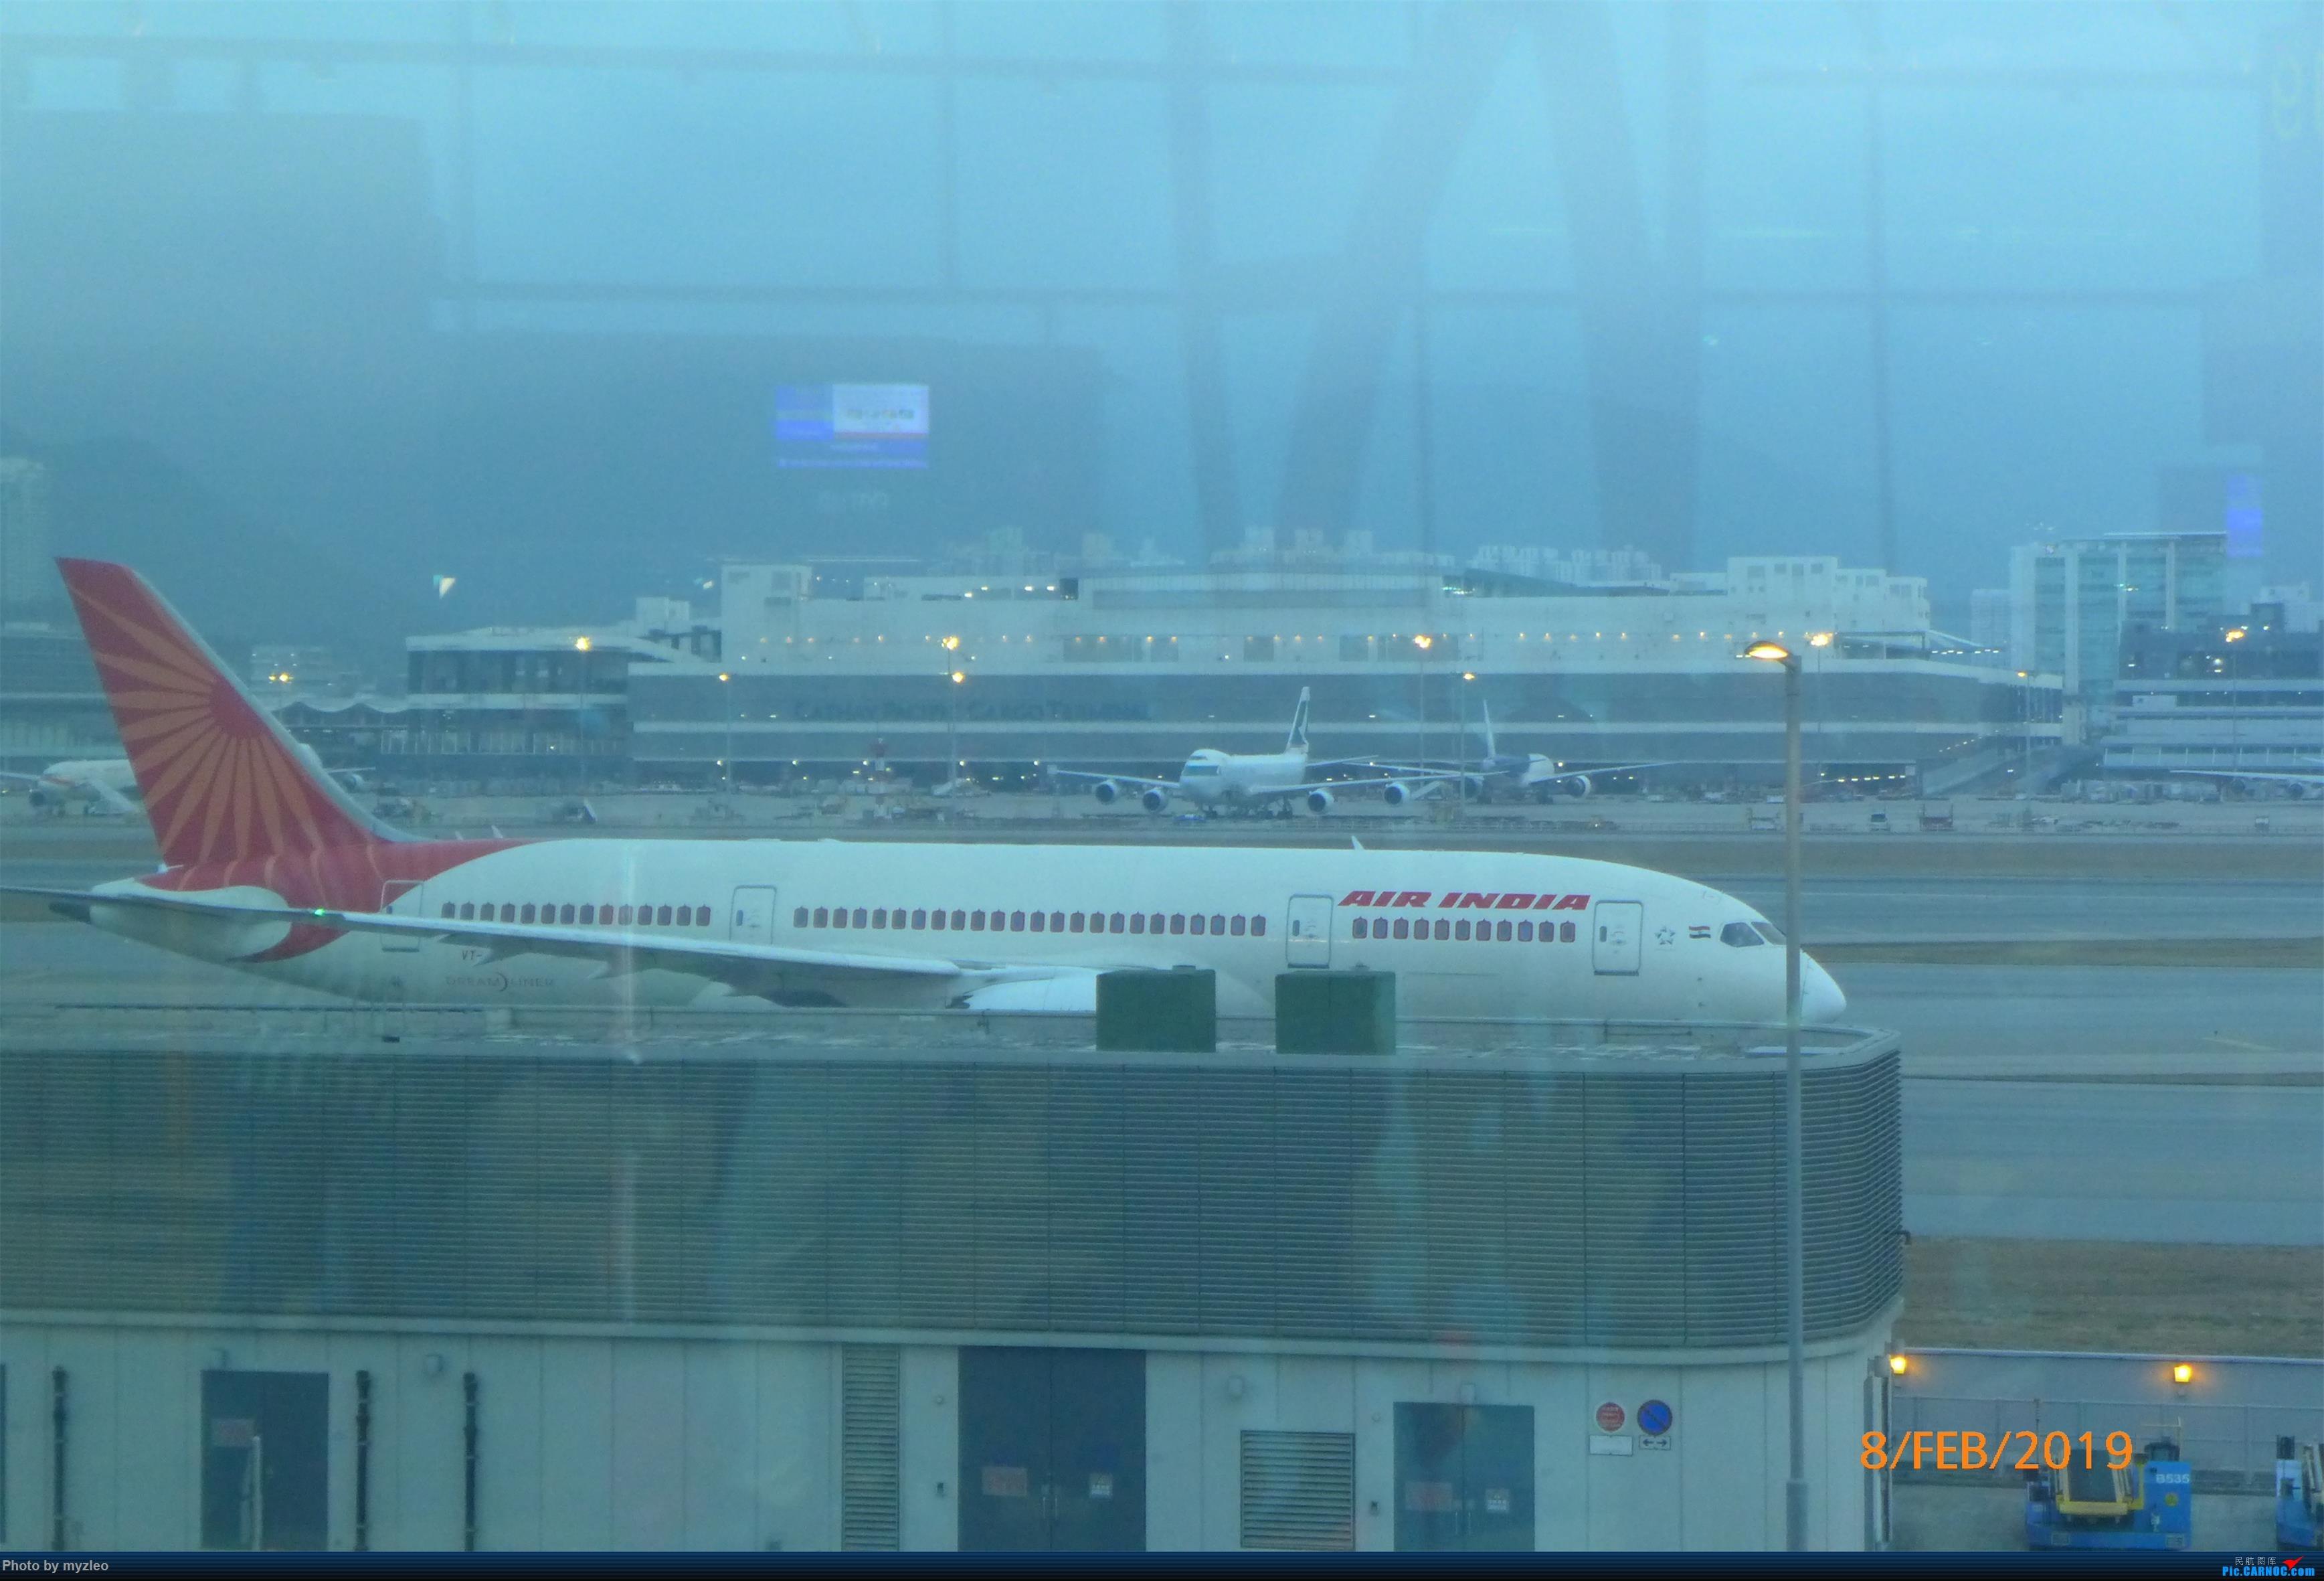 Re:[原创]【myzleo的游记4.5】十年之约(5)在香港的最后一天,搭乘港航333回沪 BOEING 787-8  中国香港国际机场